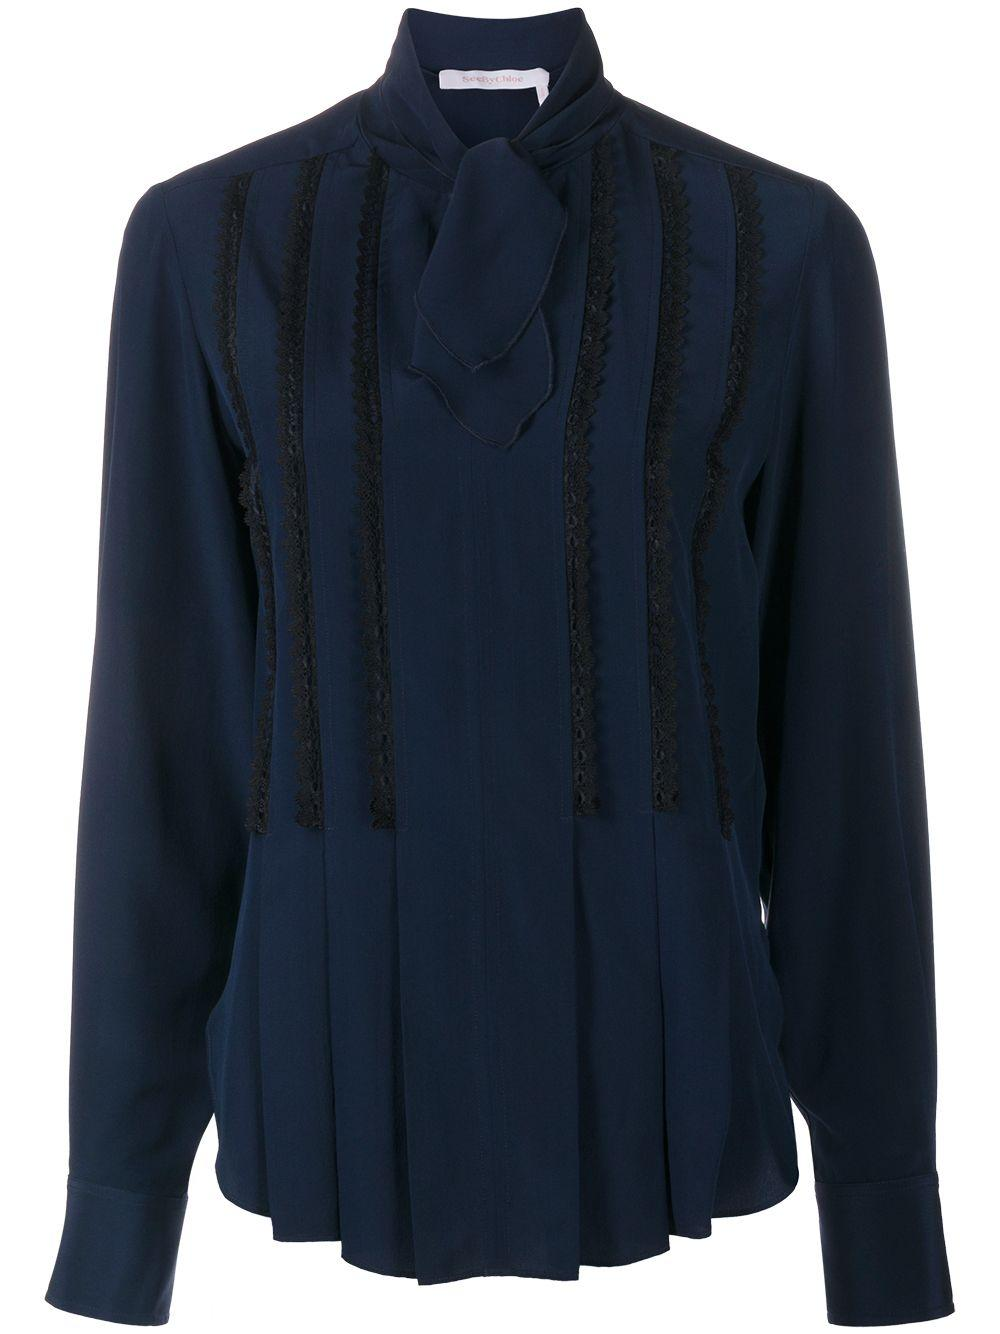 Scalloped- Lace Bow Blouse Item # CHS20WHT13011